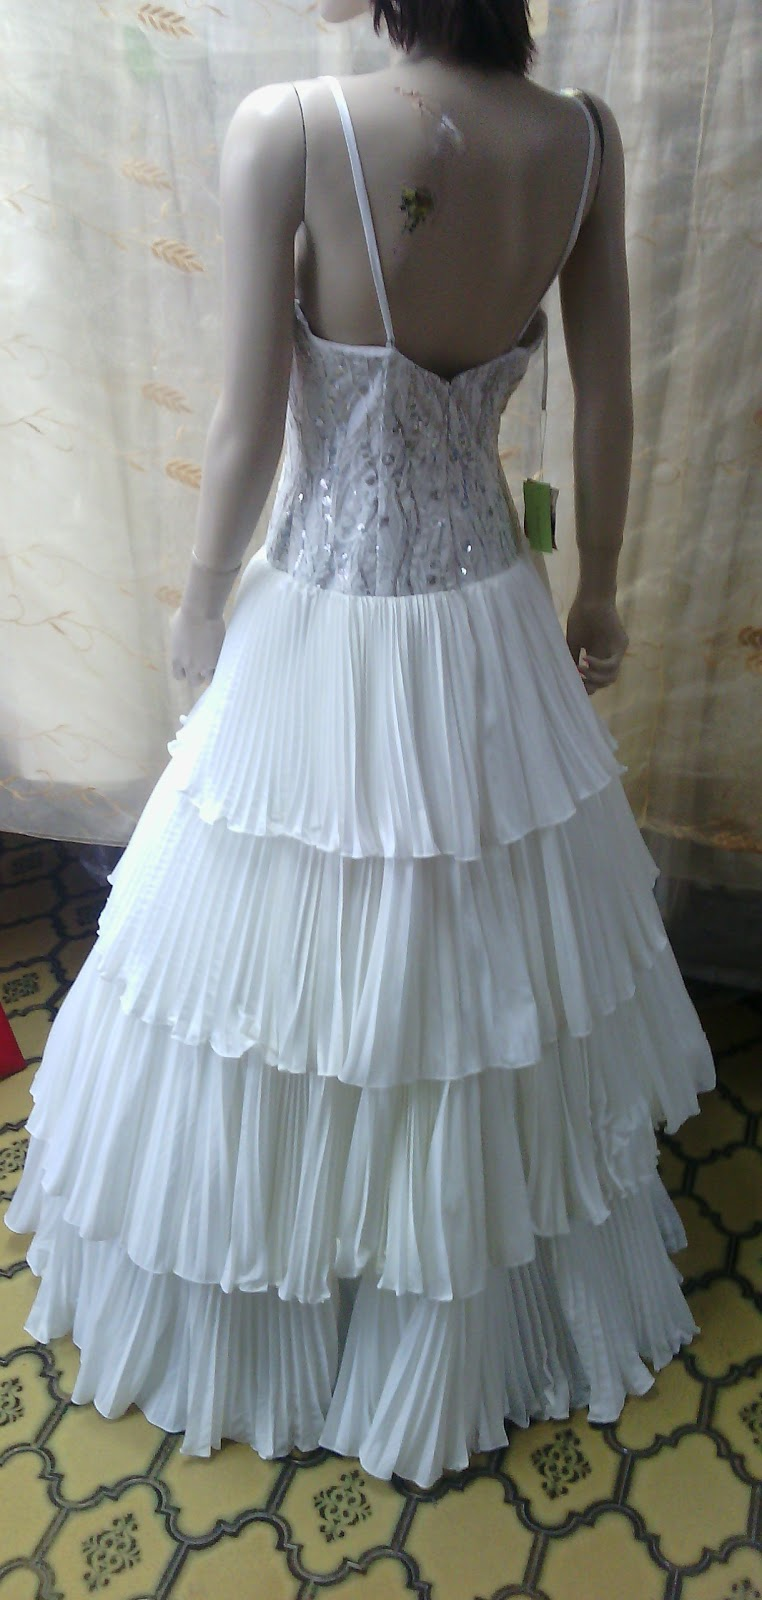 Tiendamatador: Vestido de novia en blanco pomposo talla 40